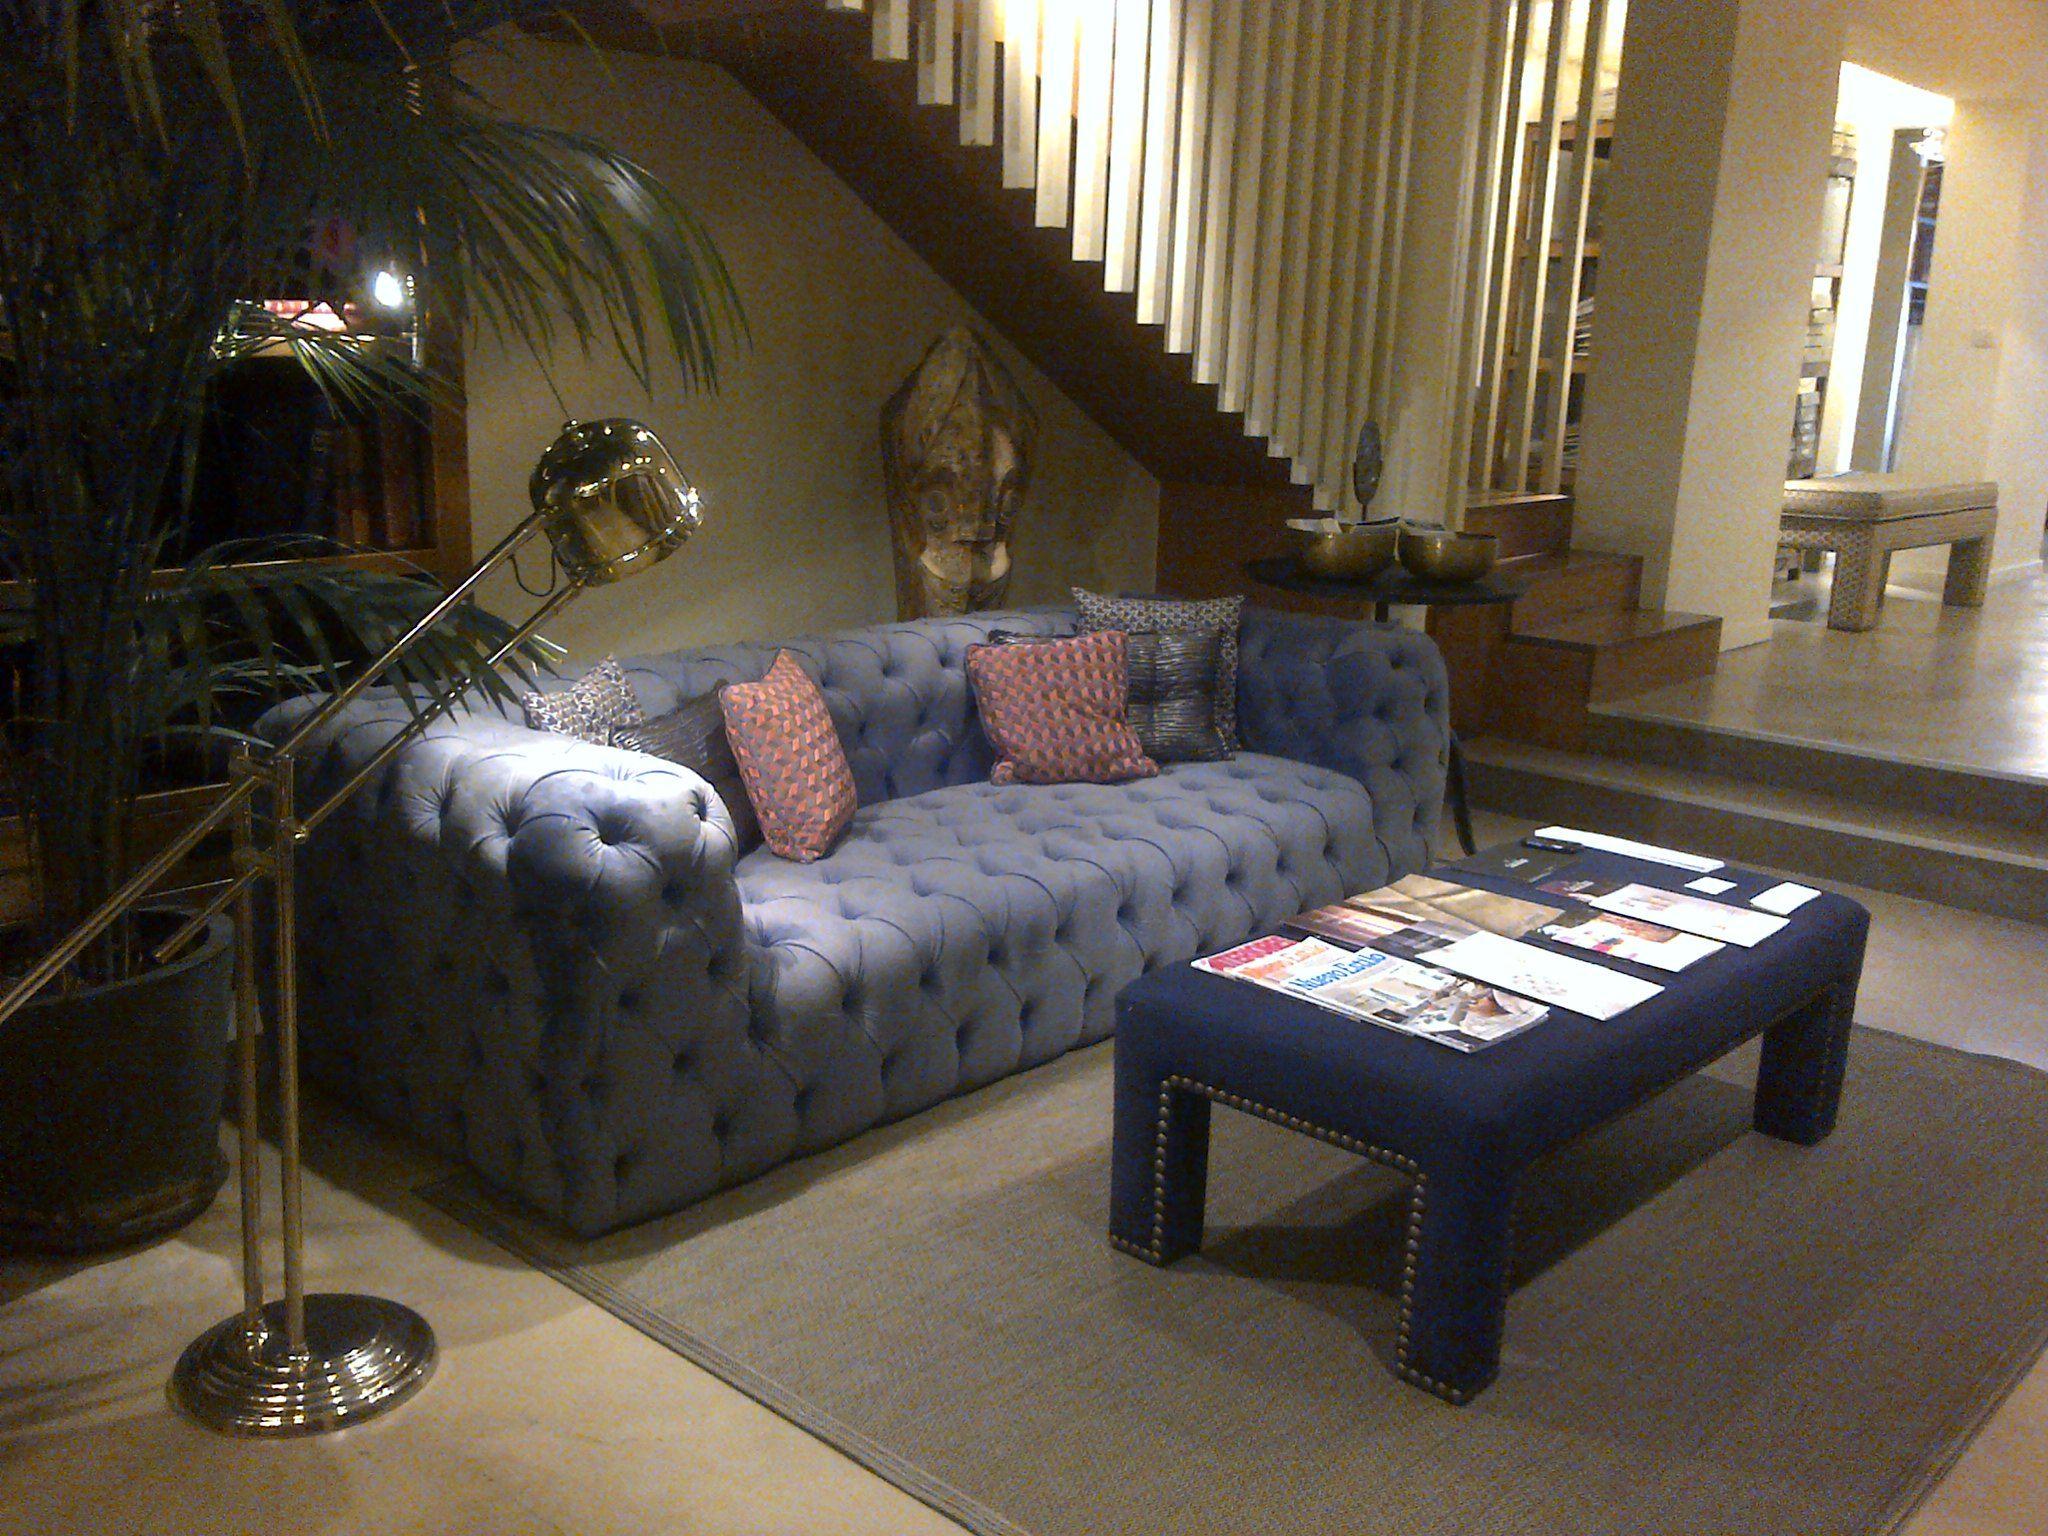 Verano en pepe pe alver barcelona intede design fabrics - Muebles penalver ...